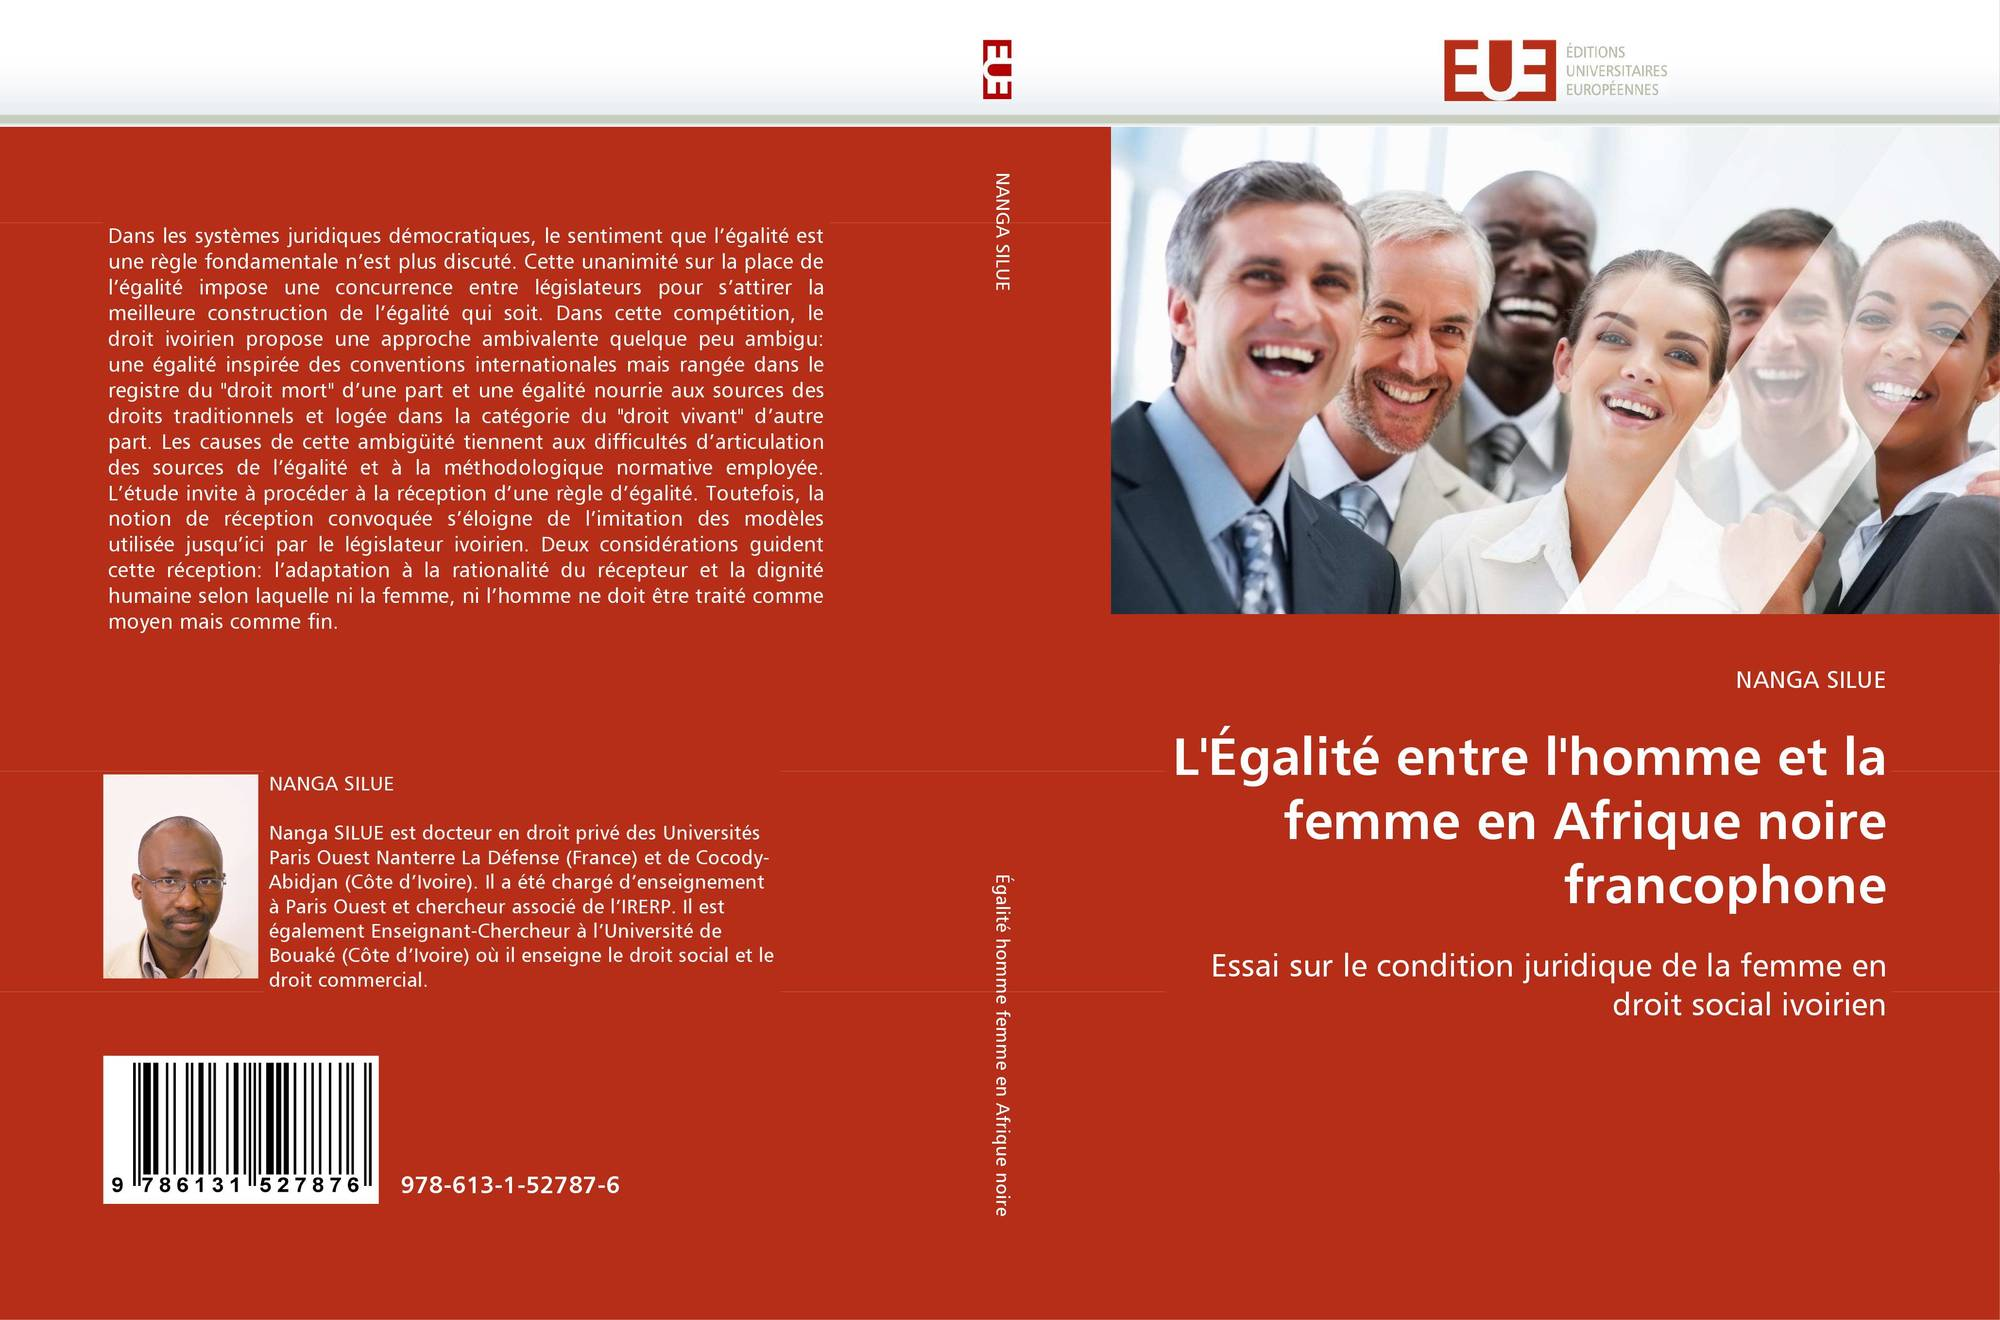 l 39 galit entre l 39 homme et la femme en afrique noire francophone 978 613 1 52787 6 6131527873. Black Bedroom Furniture Sets. Home Design Ideas